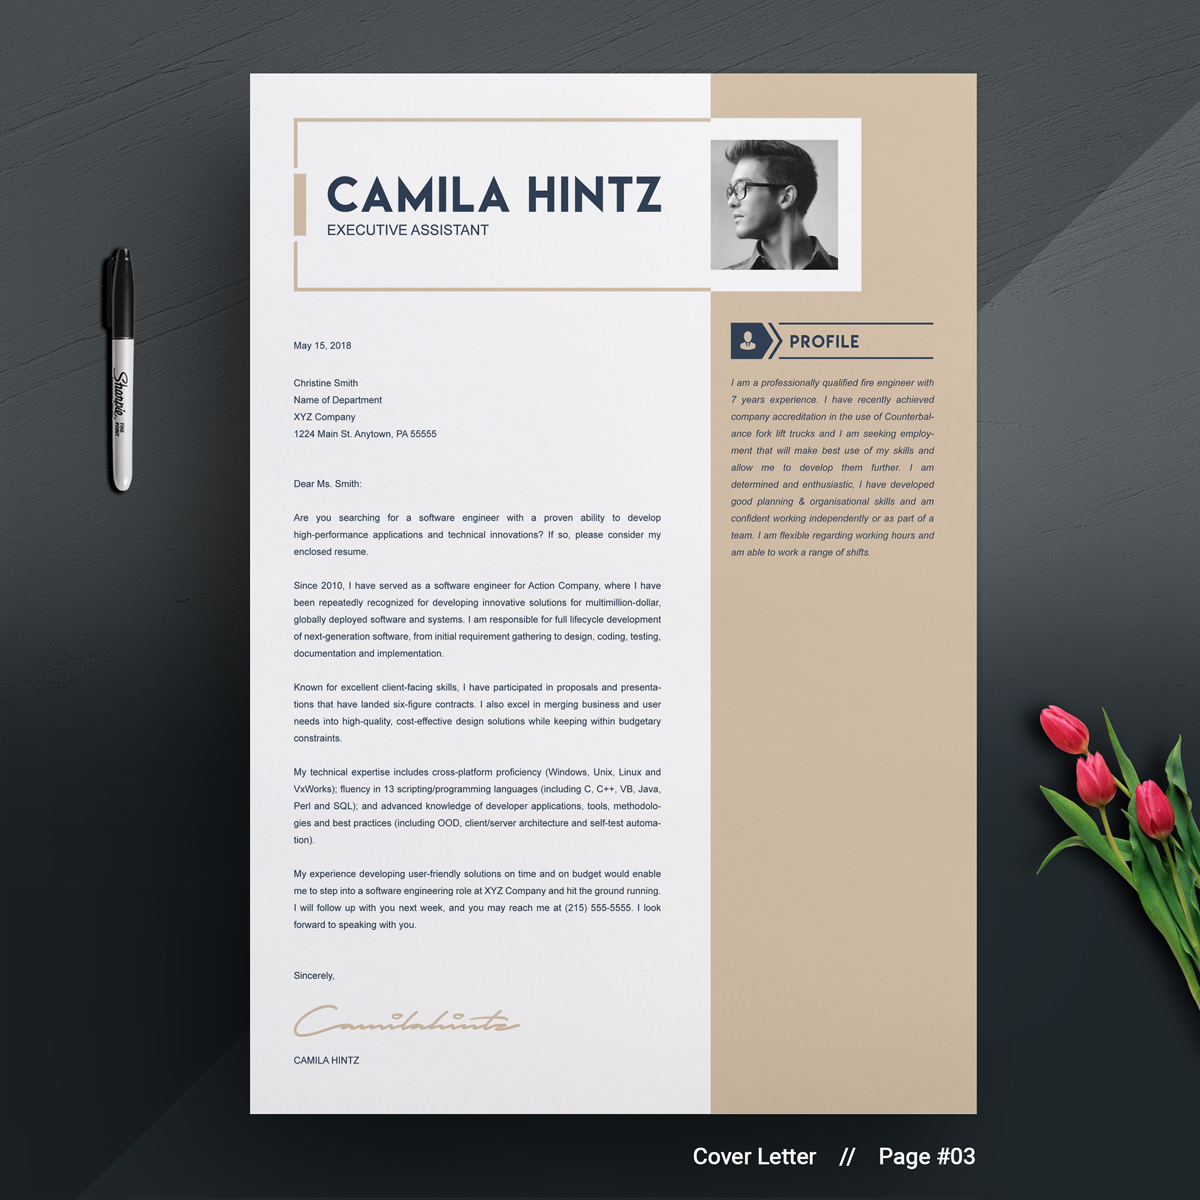 Camila Hintz Resume Template